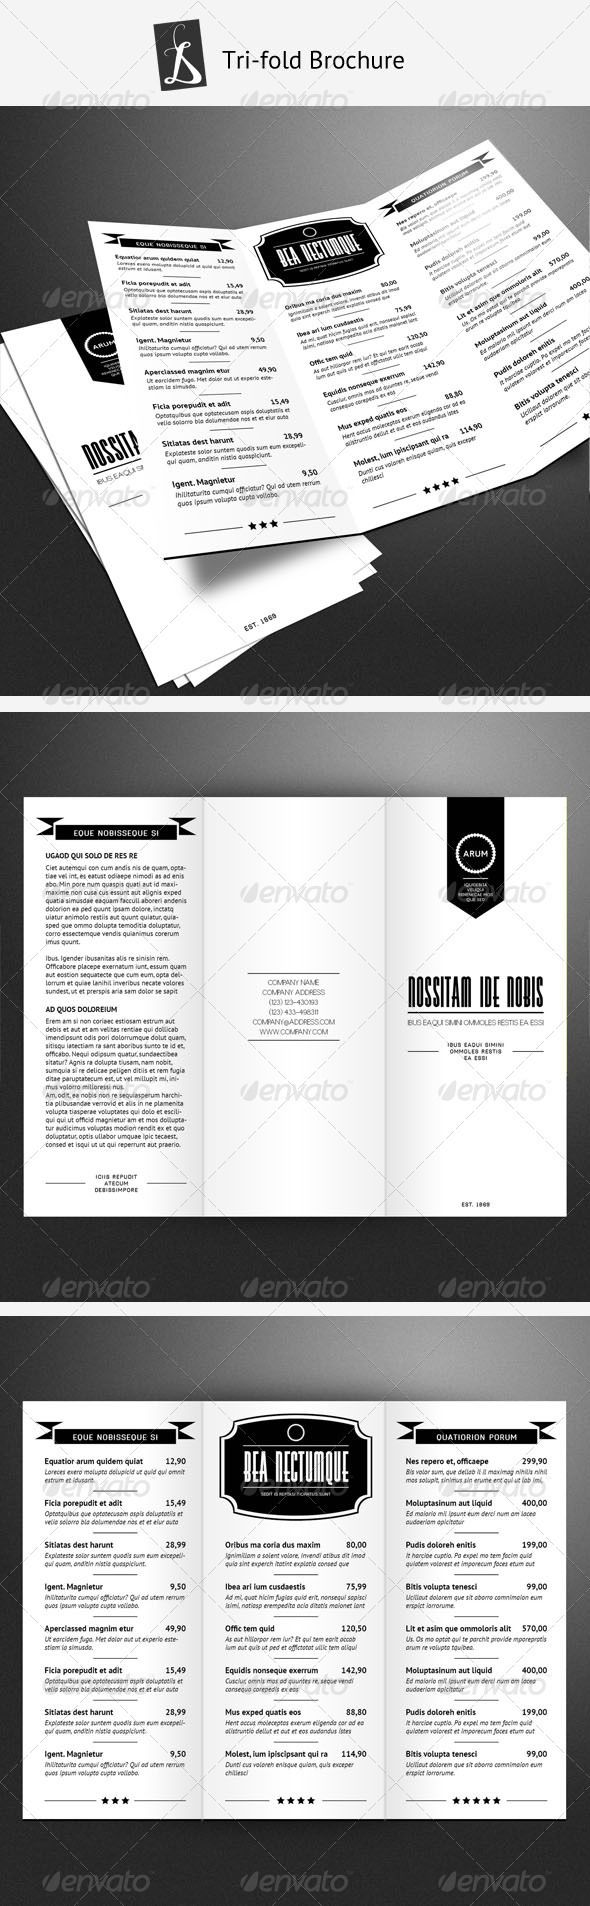 Tri-fold Brochure 2 | Tri fold brochure, Brochures and Menu templates